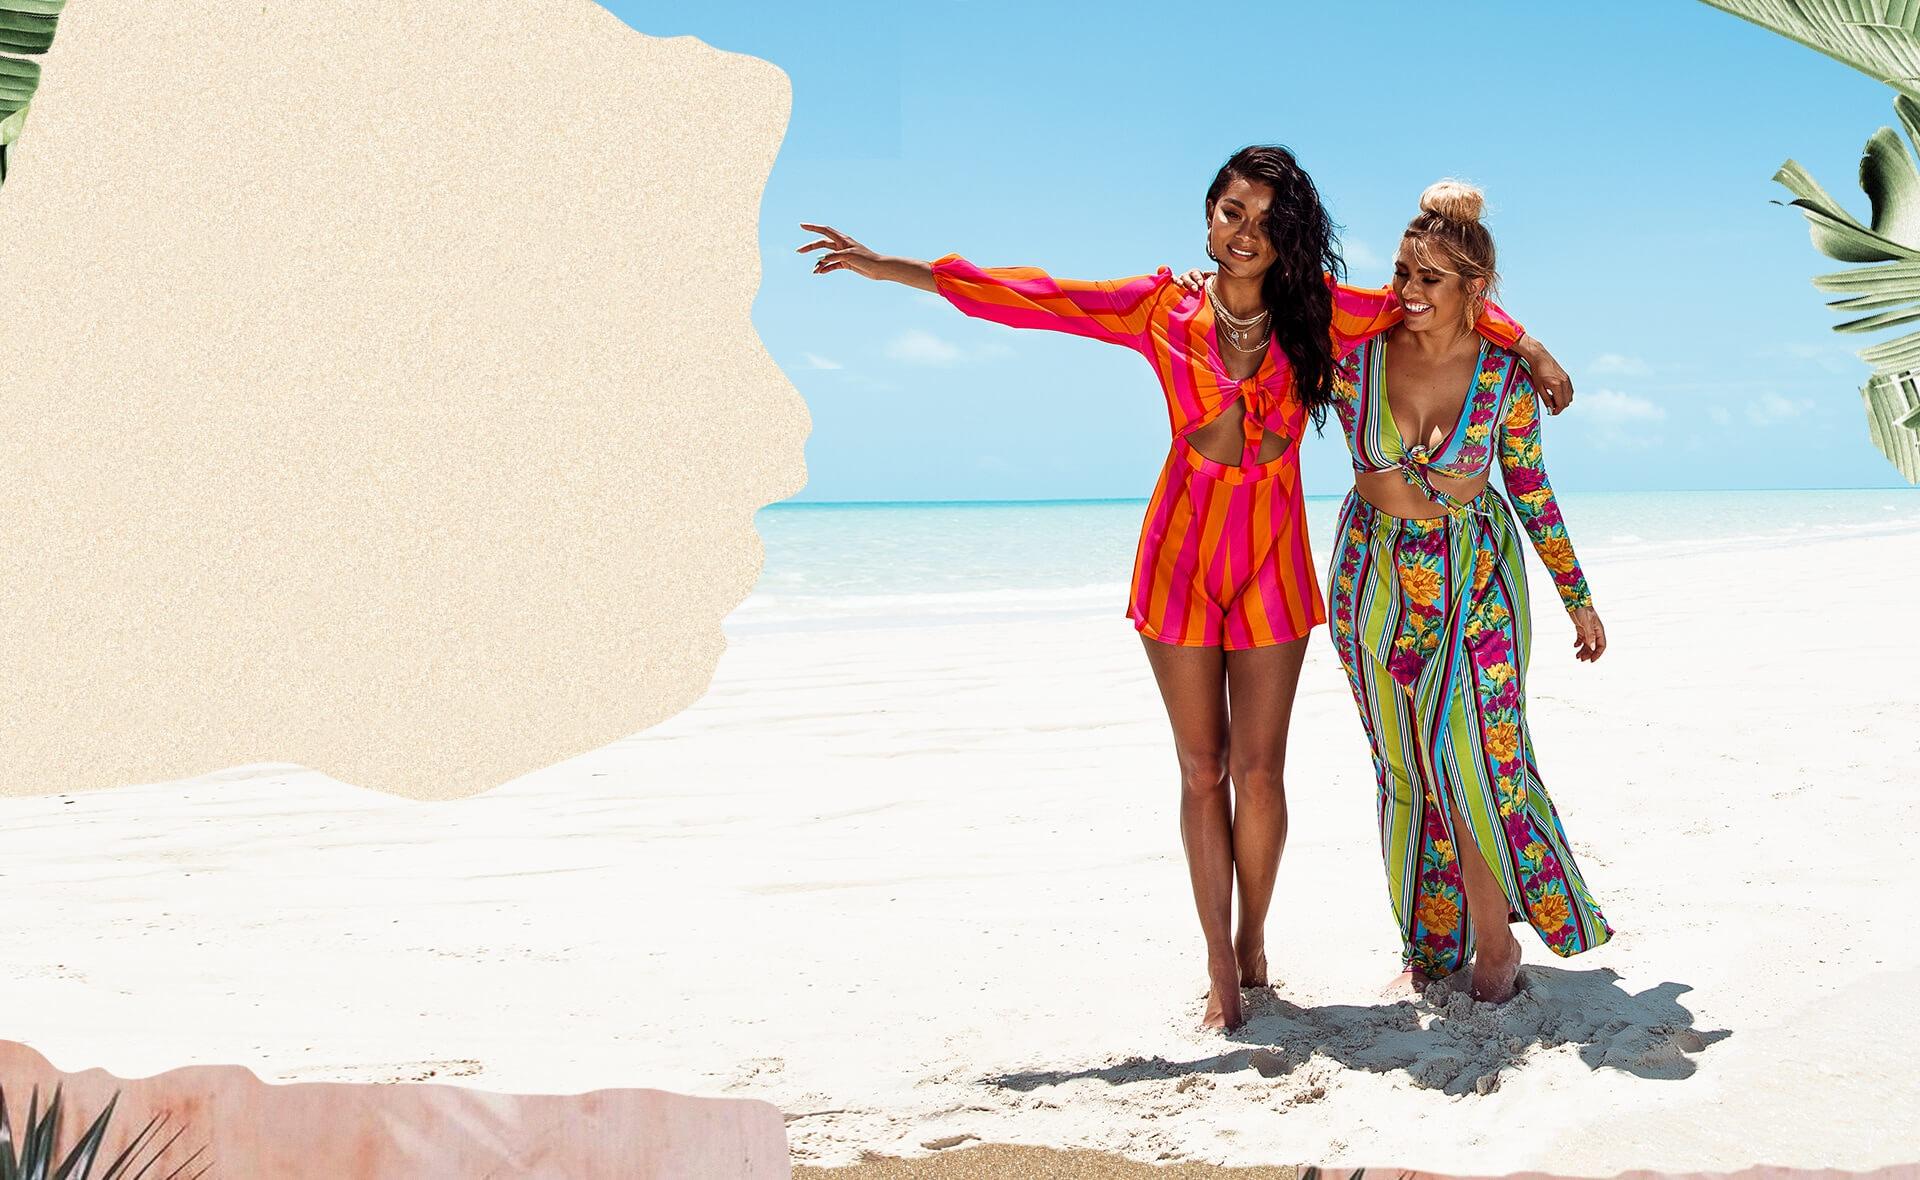 Destination Ibiza Image